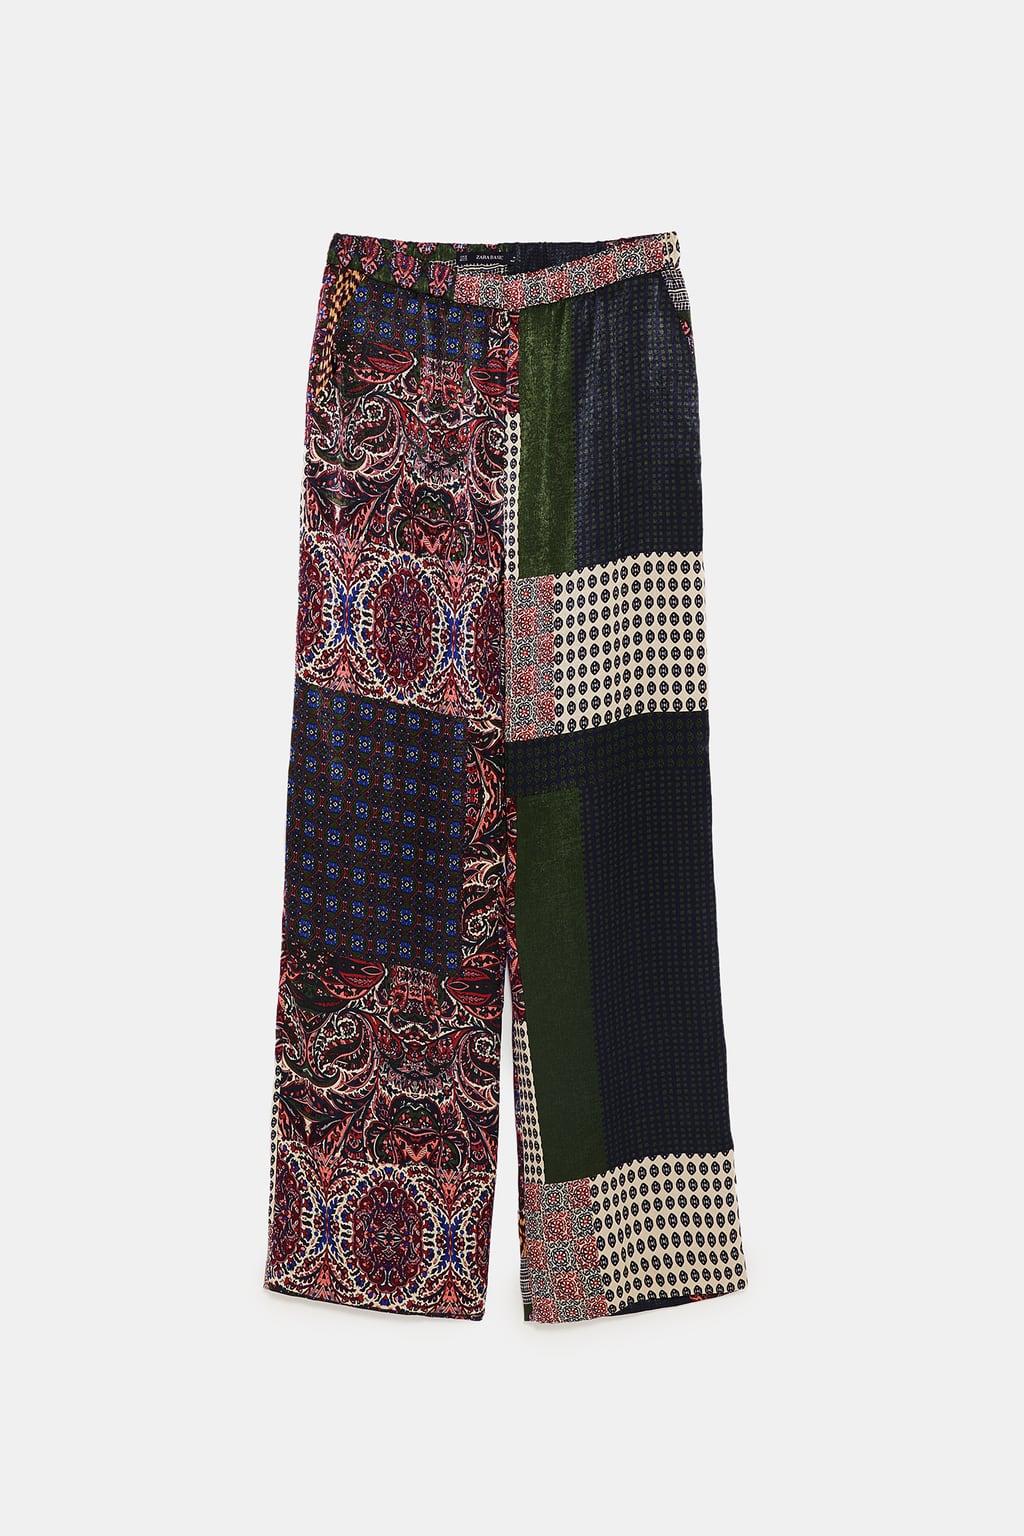 pantalon patchwork zara